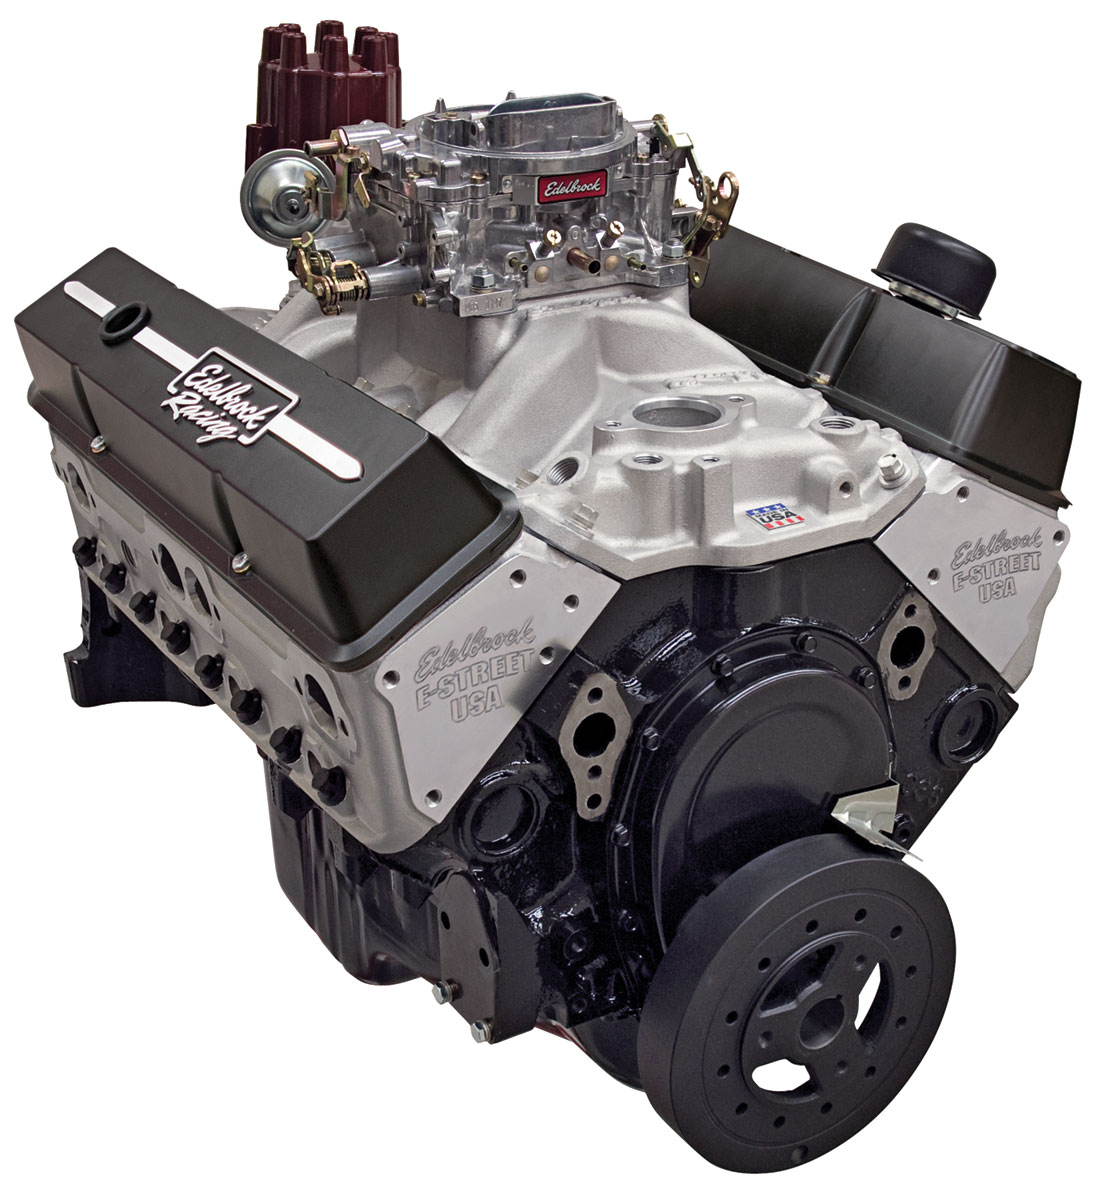 Crate Engine, E-Street 315HP Carbureted, Edelbrock, Chevrolet 350, Satin